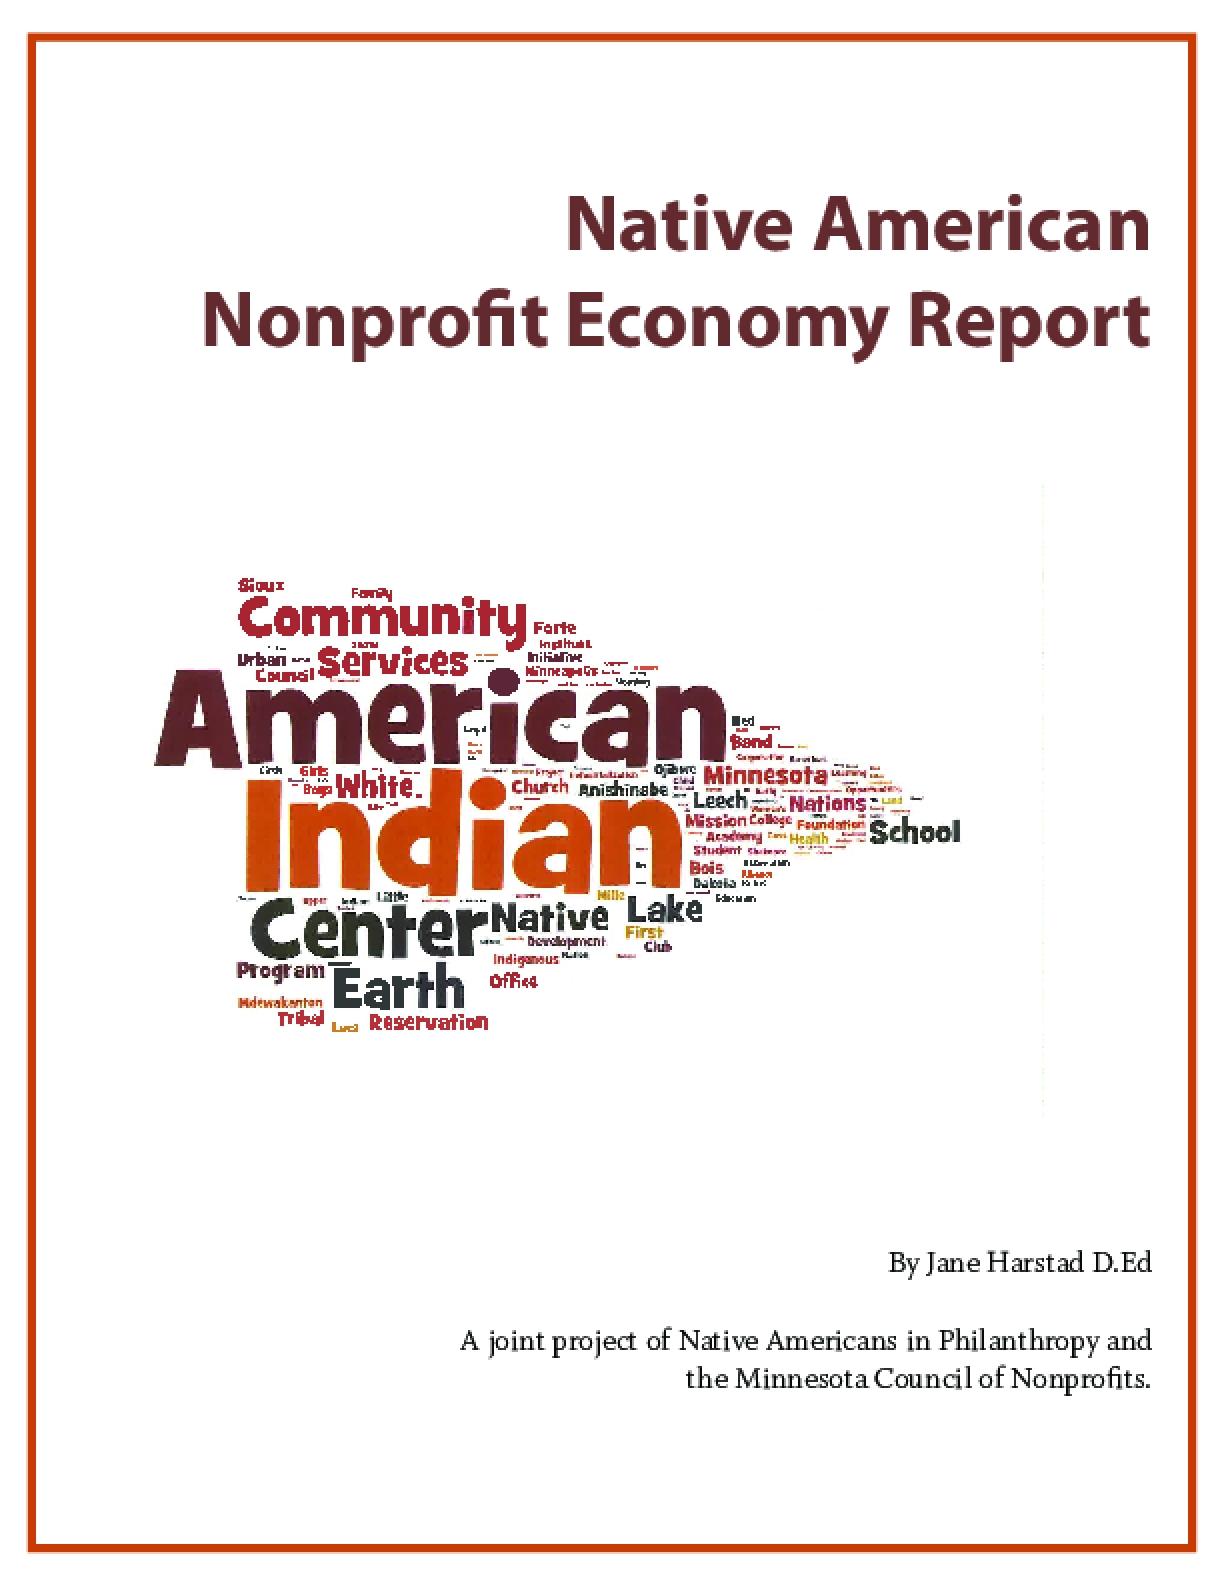 Native American Nonprofit Economy Report